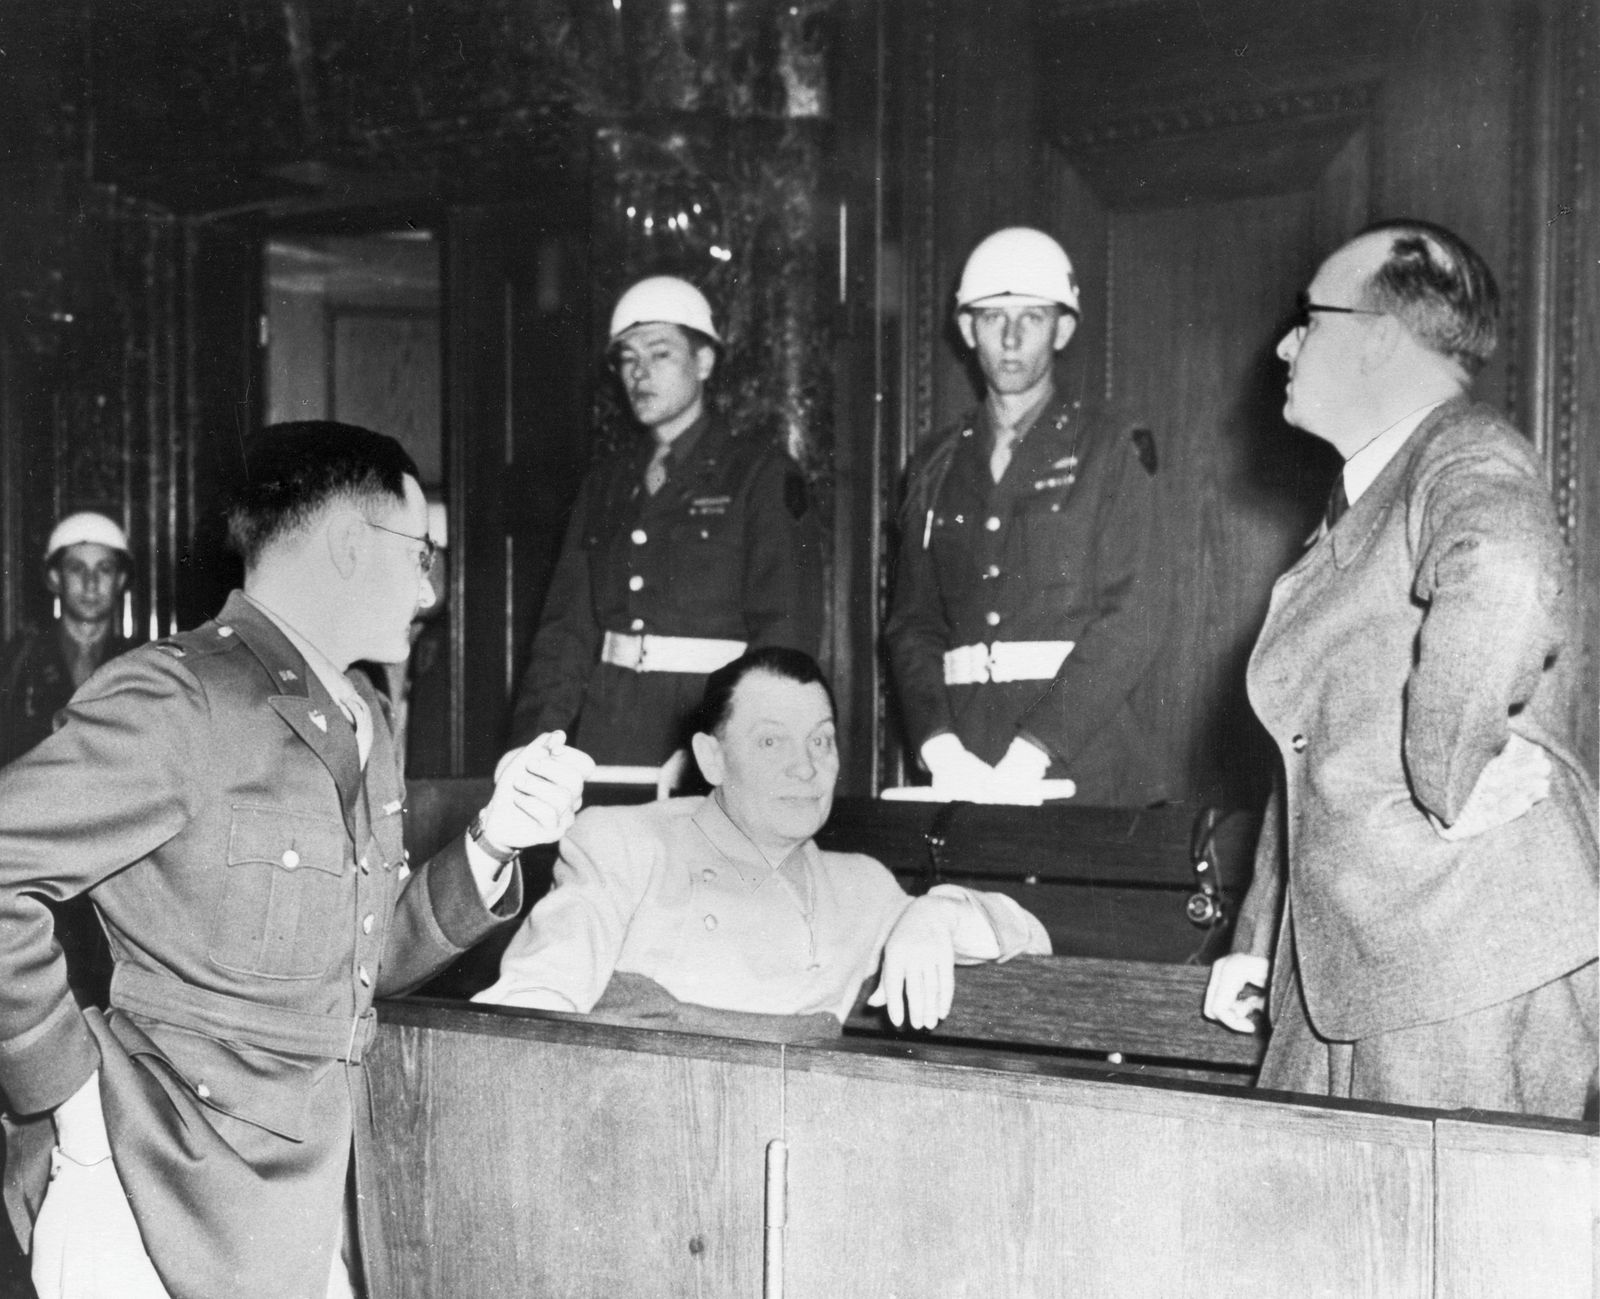 Nürnberger Prozess gegen die Hauptkriegsverbrecher (14.11.1945 - 01.10.1946)